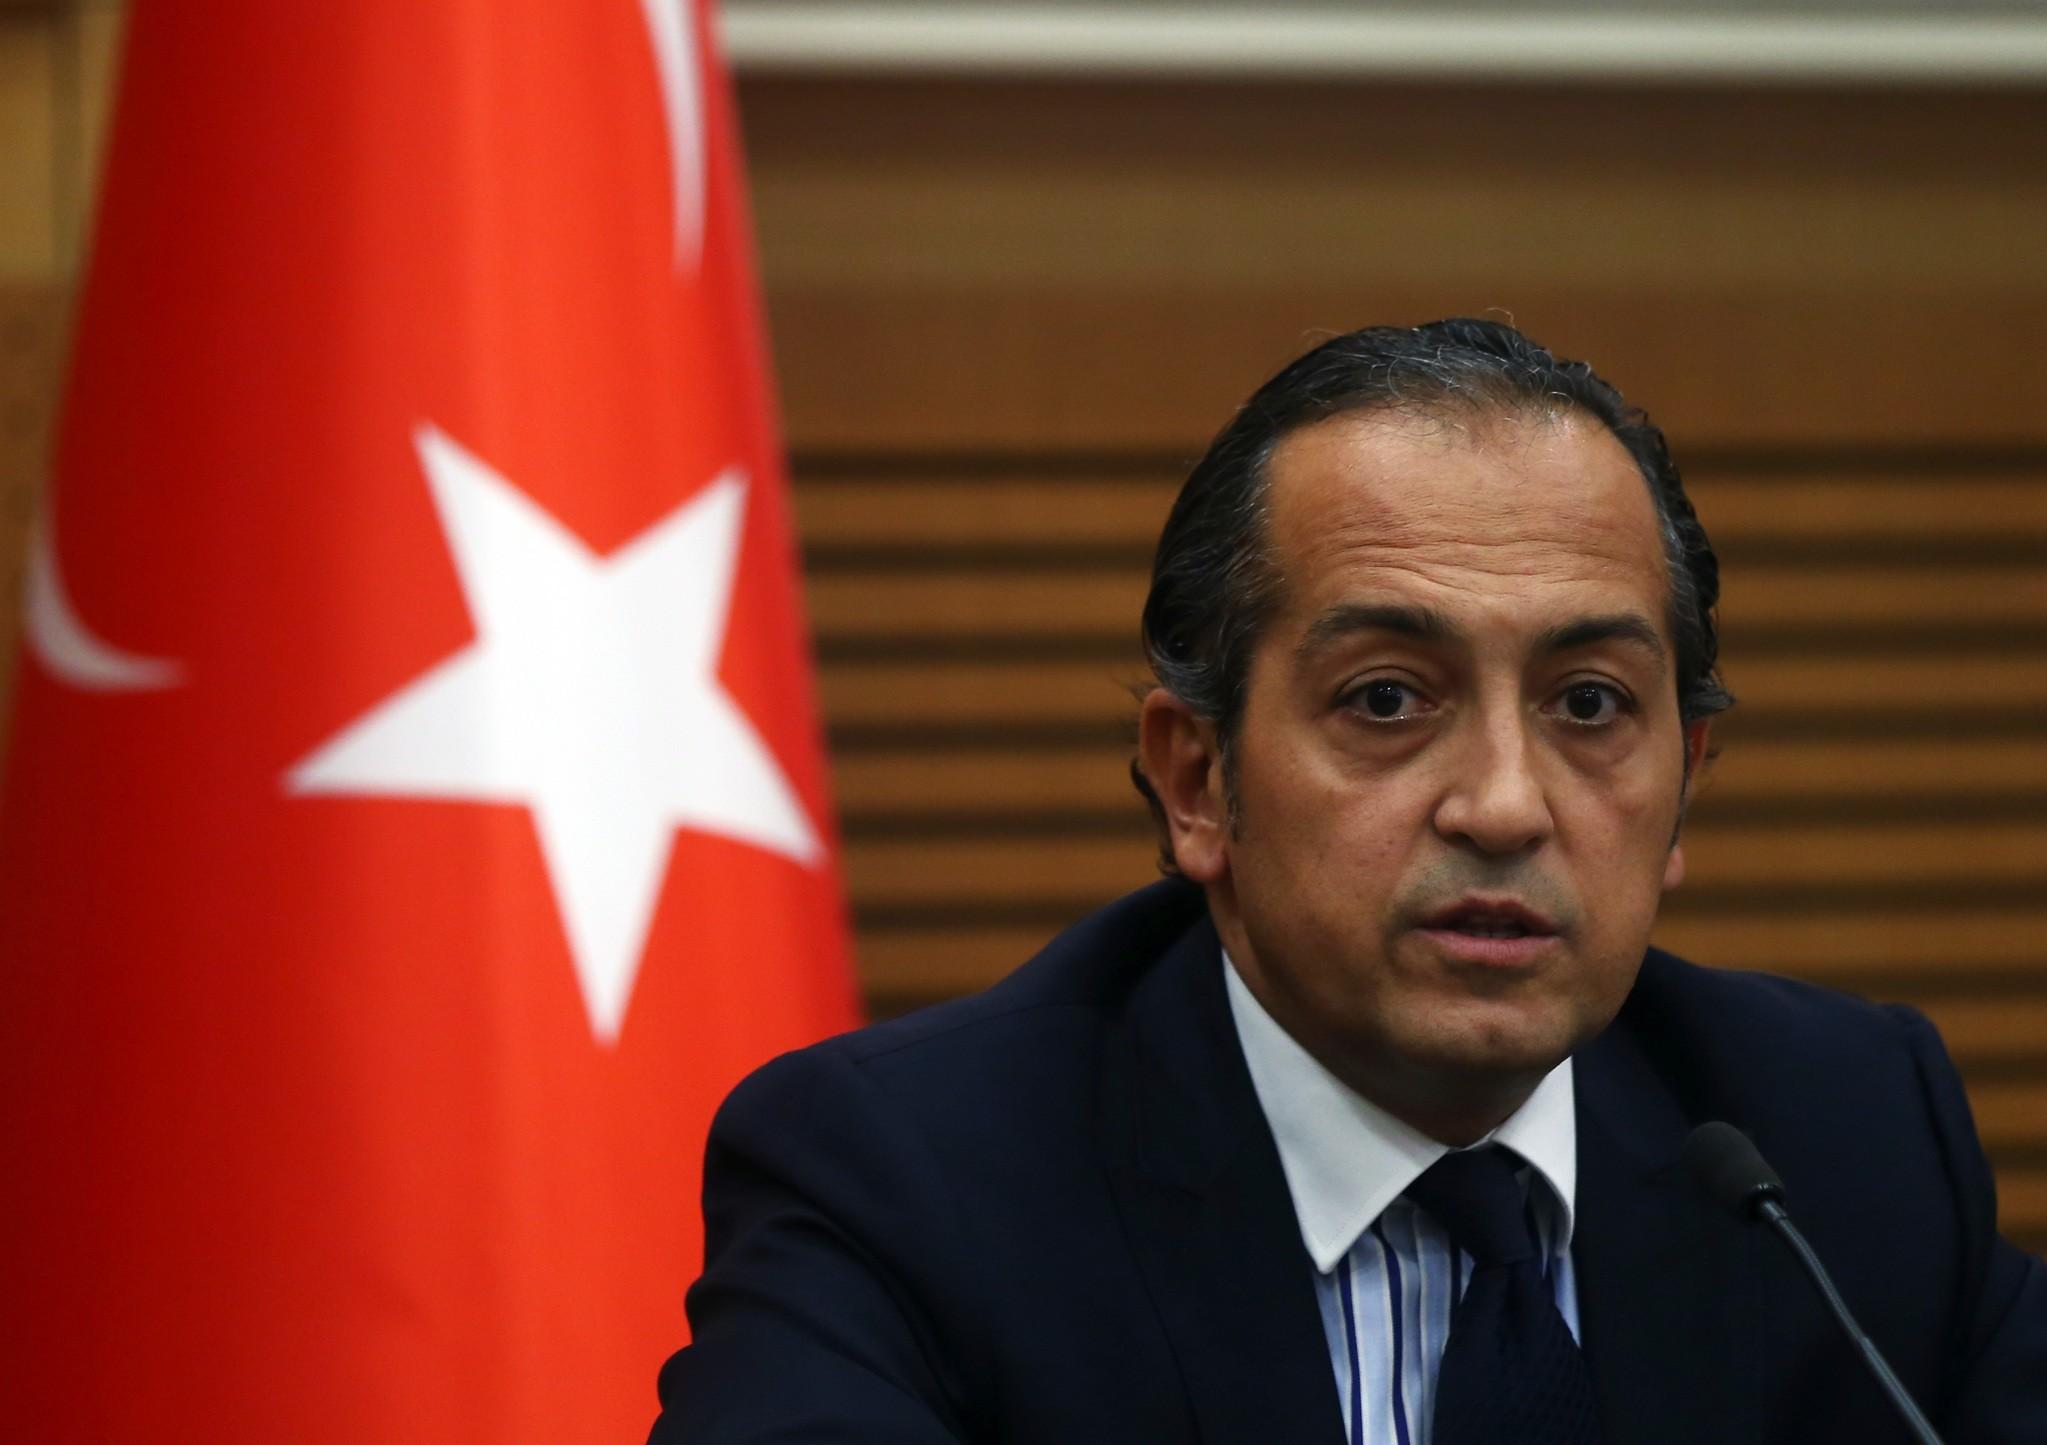 Foreign Ministry Spokesperson Hu00fcseyin Mu00fcftu00fcou011flu speaking at a press conference on Nov. 7, 2016. (AA Photo)